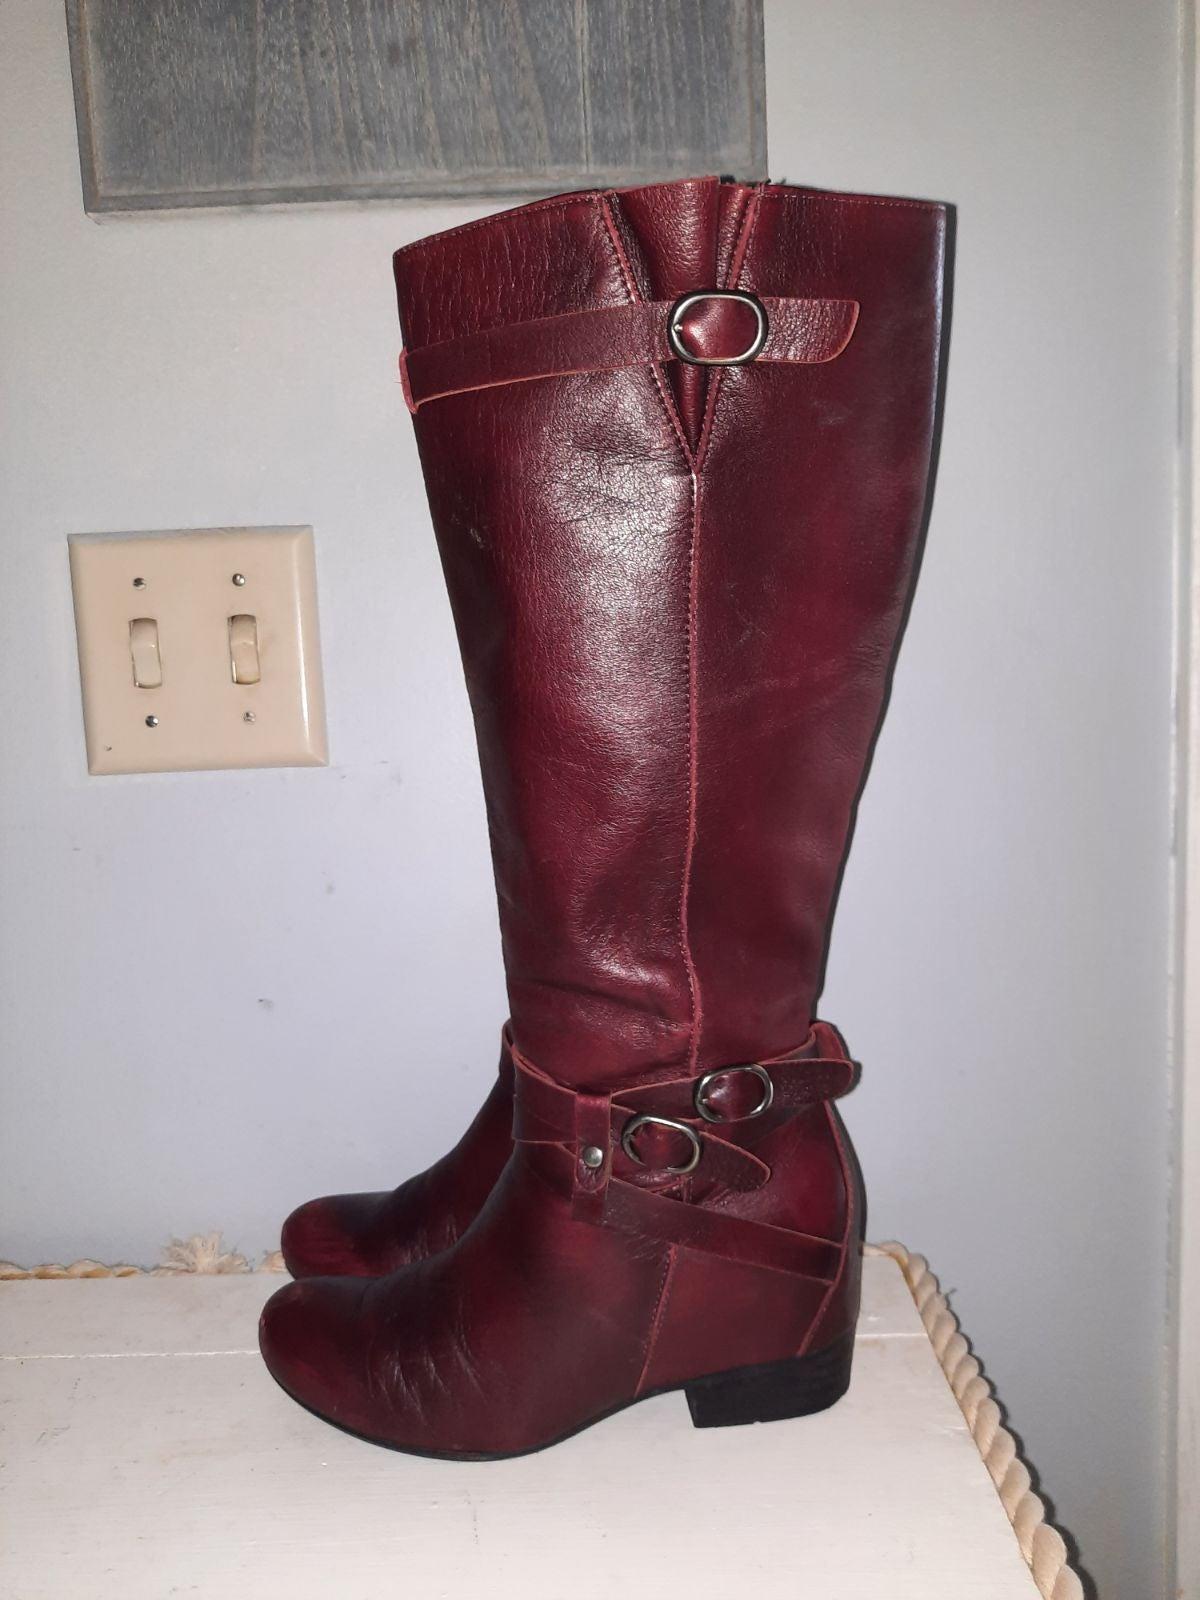 Goegeous Red Miz Mooz Boots